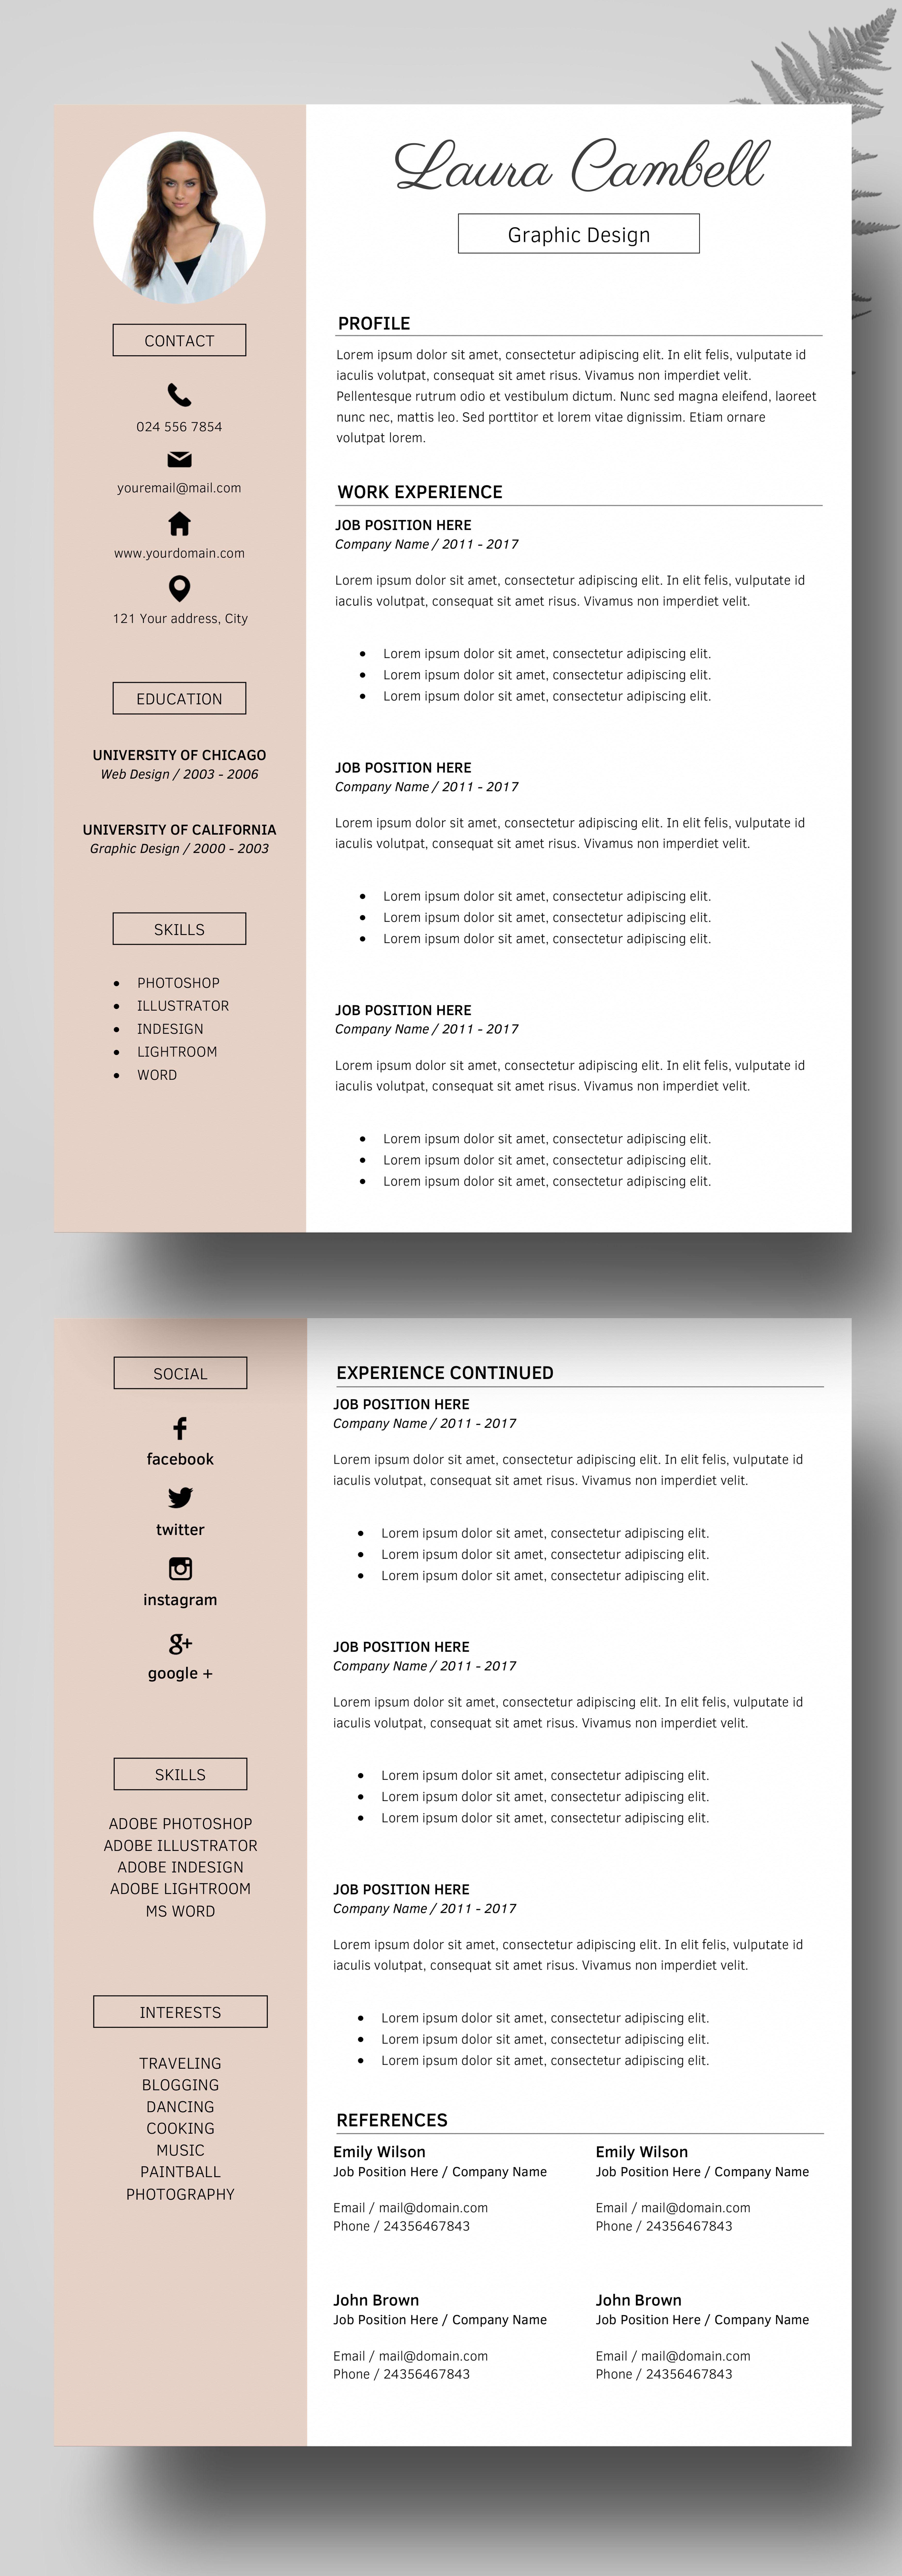 Modern Resume Template, CV Template for Word, Cover Letter